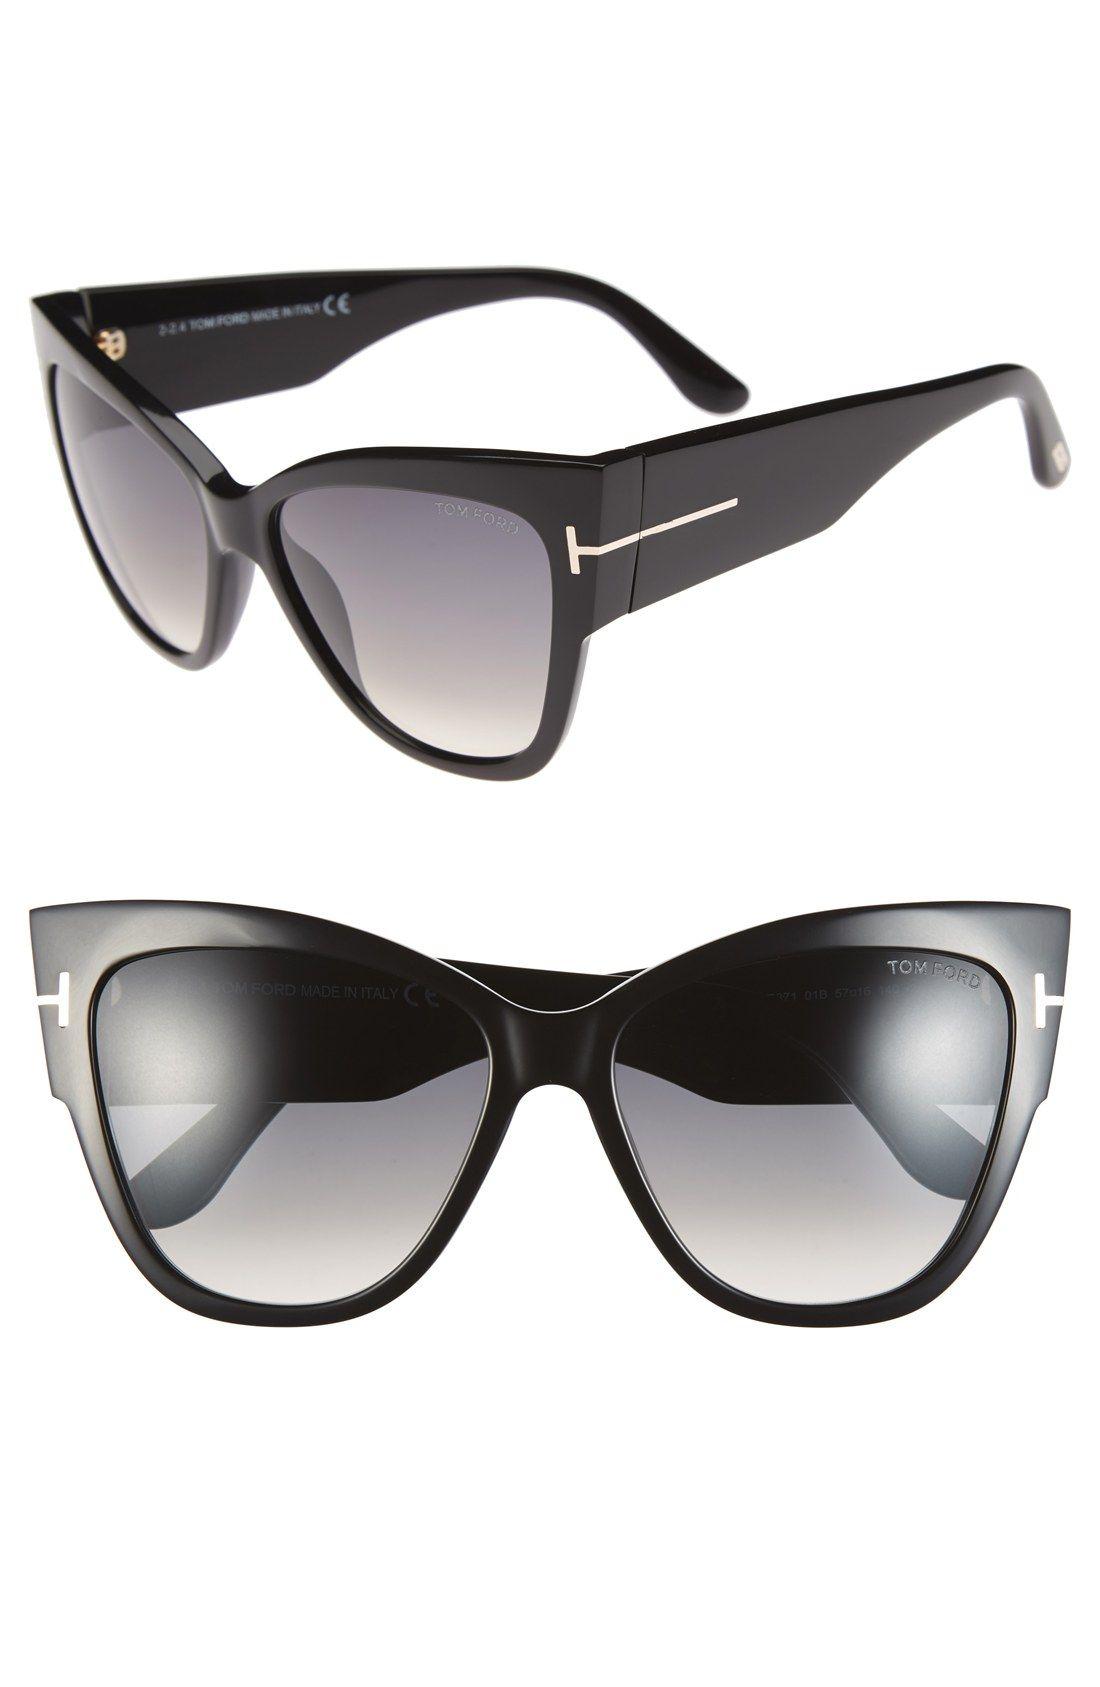 tom ford eyewear 2018 | Best Women Tom Ford Sunglasses Photos 2017 ...